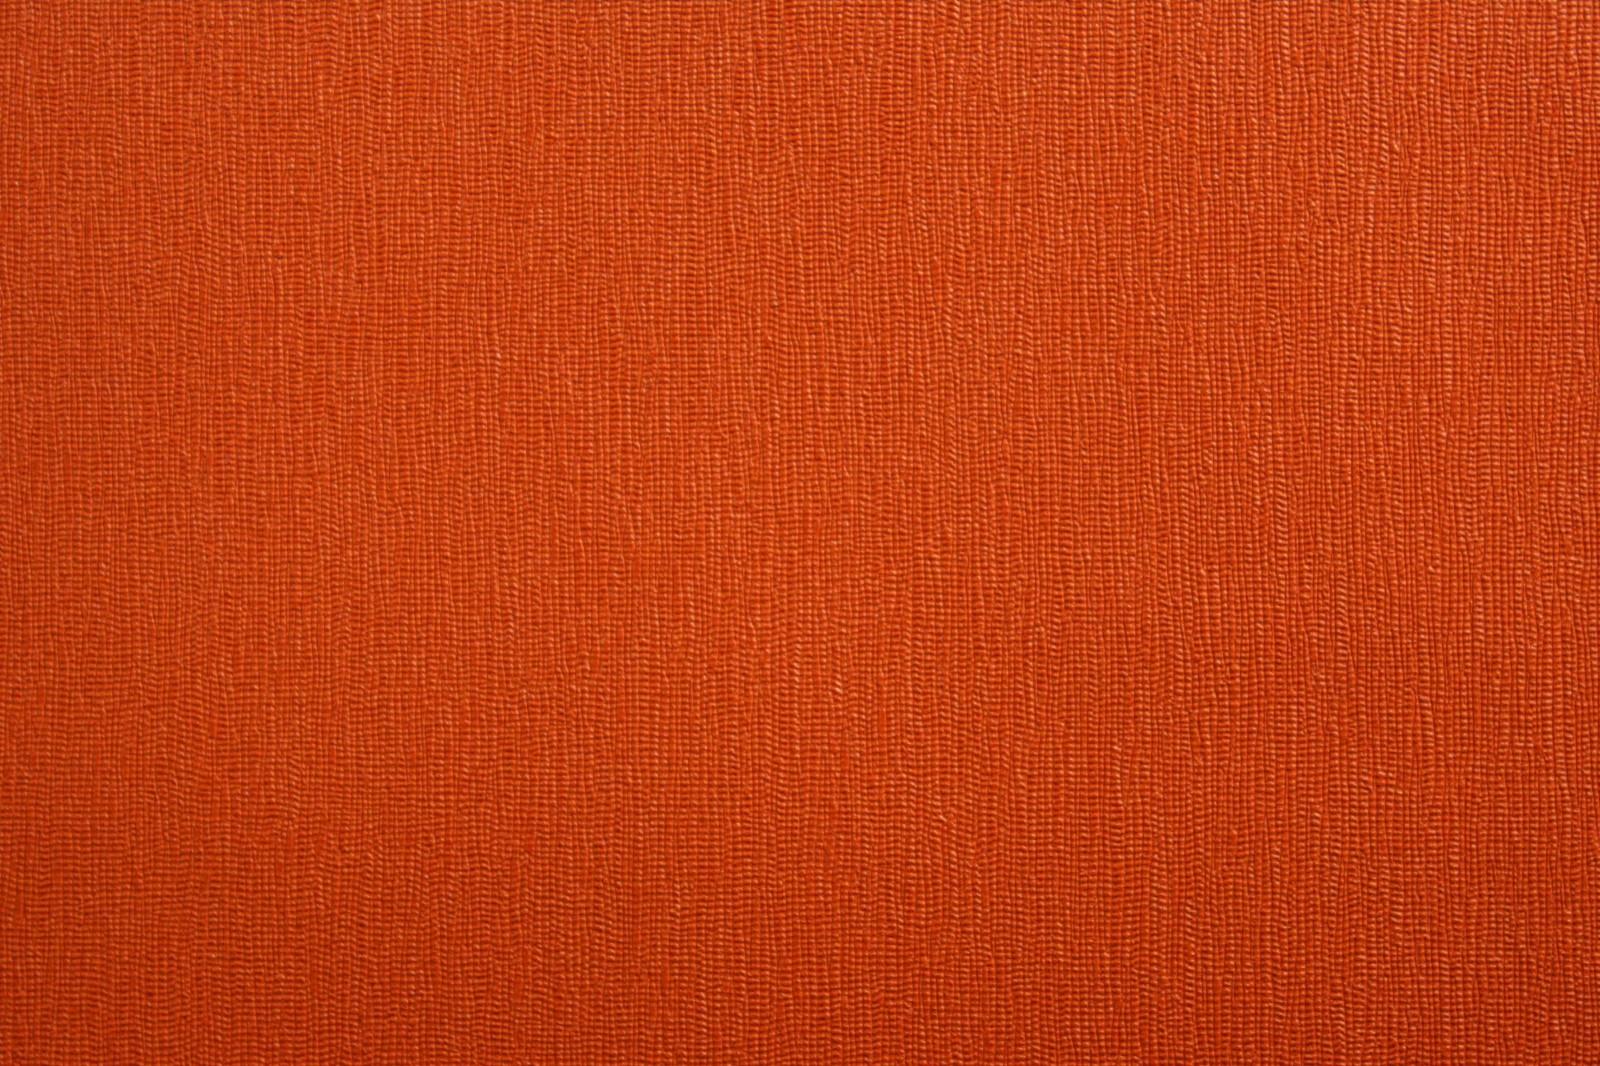 Tapete  Rasch  Seduction  796230  Uni  rot orange  - Tapete Orange